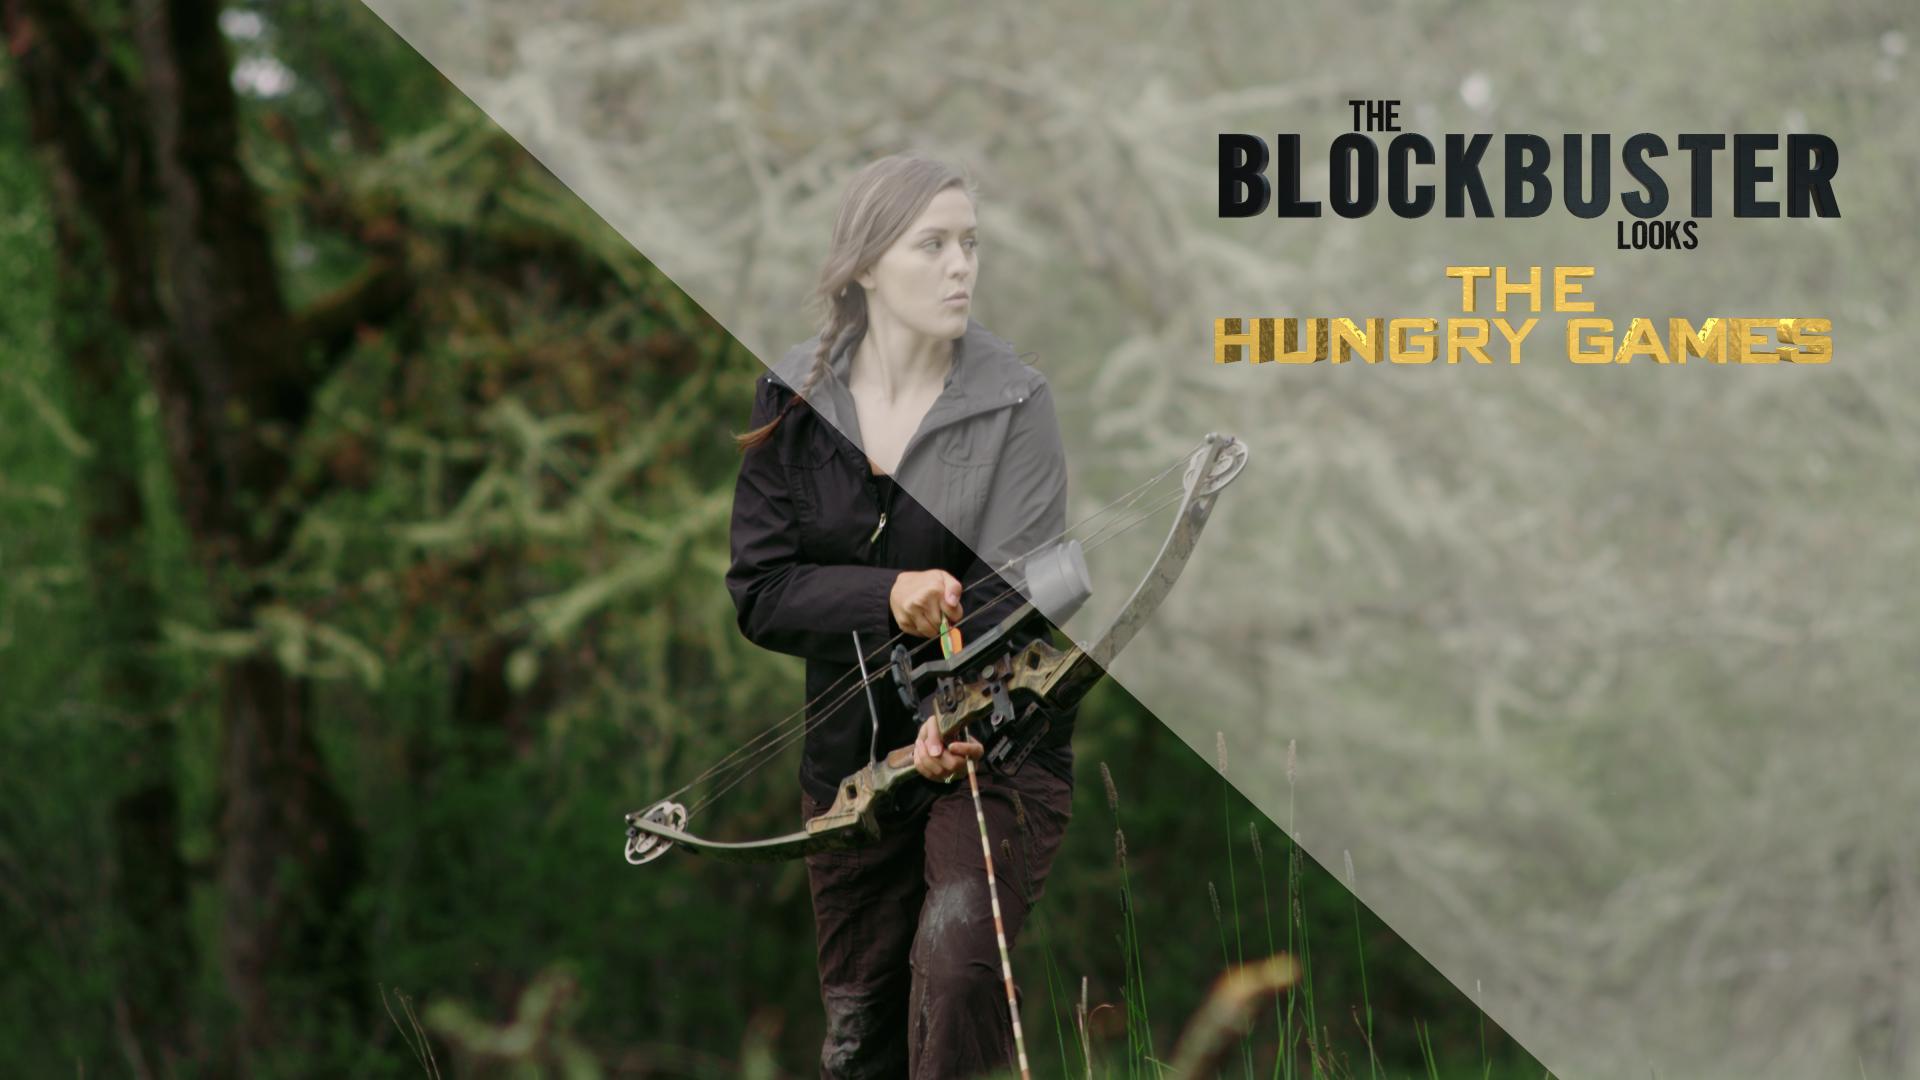 Blockbuster Looks for Premiere Pro by Neumann Films